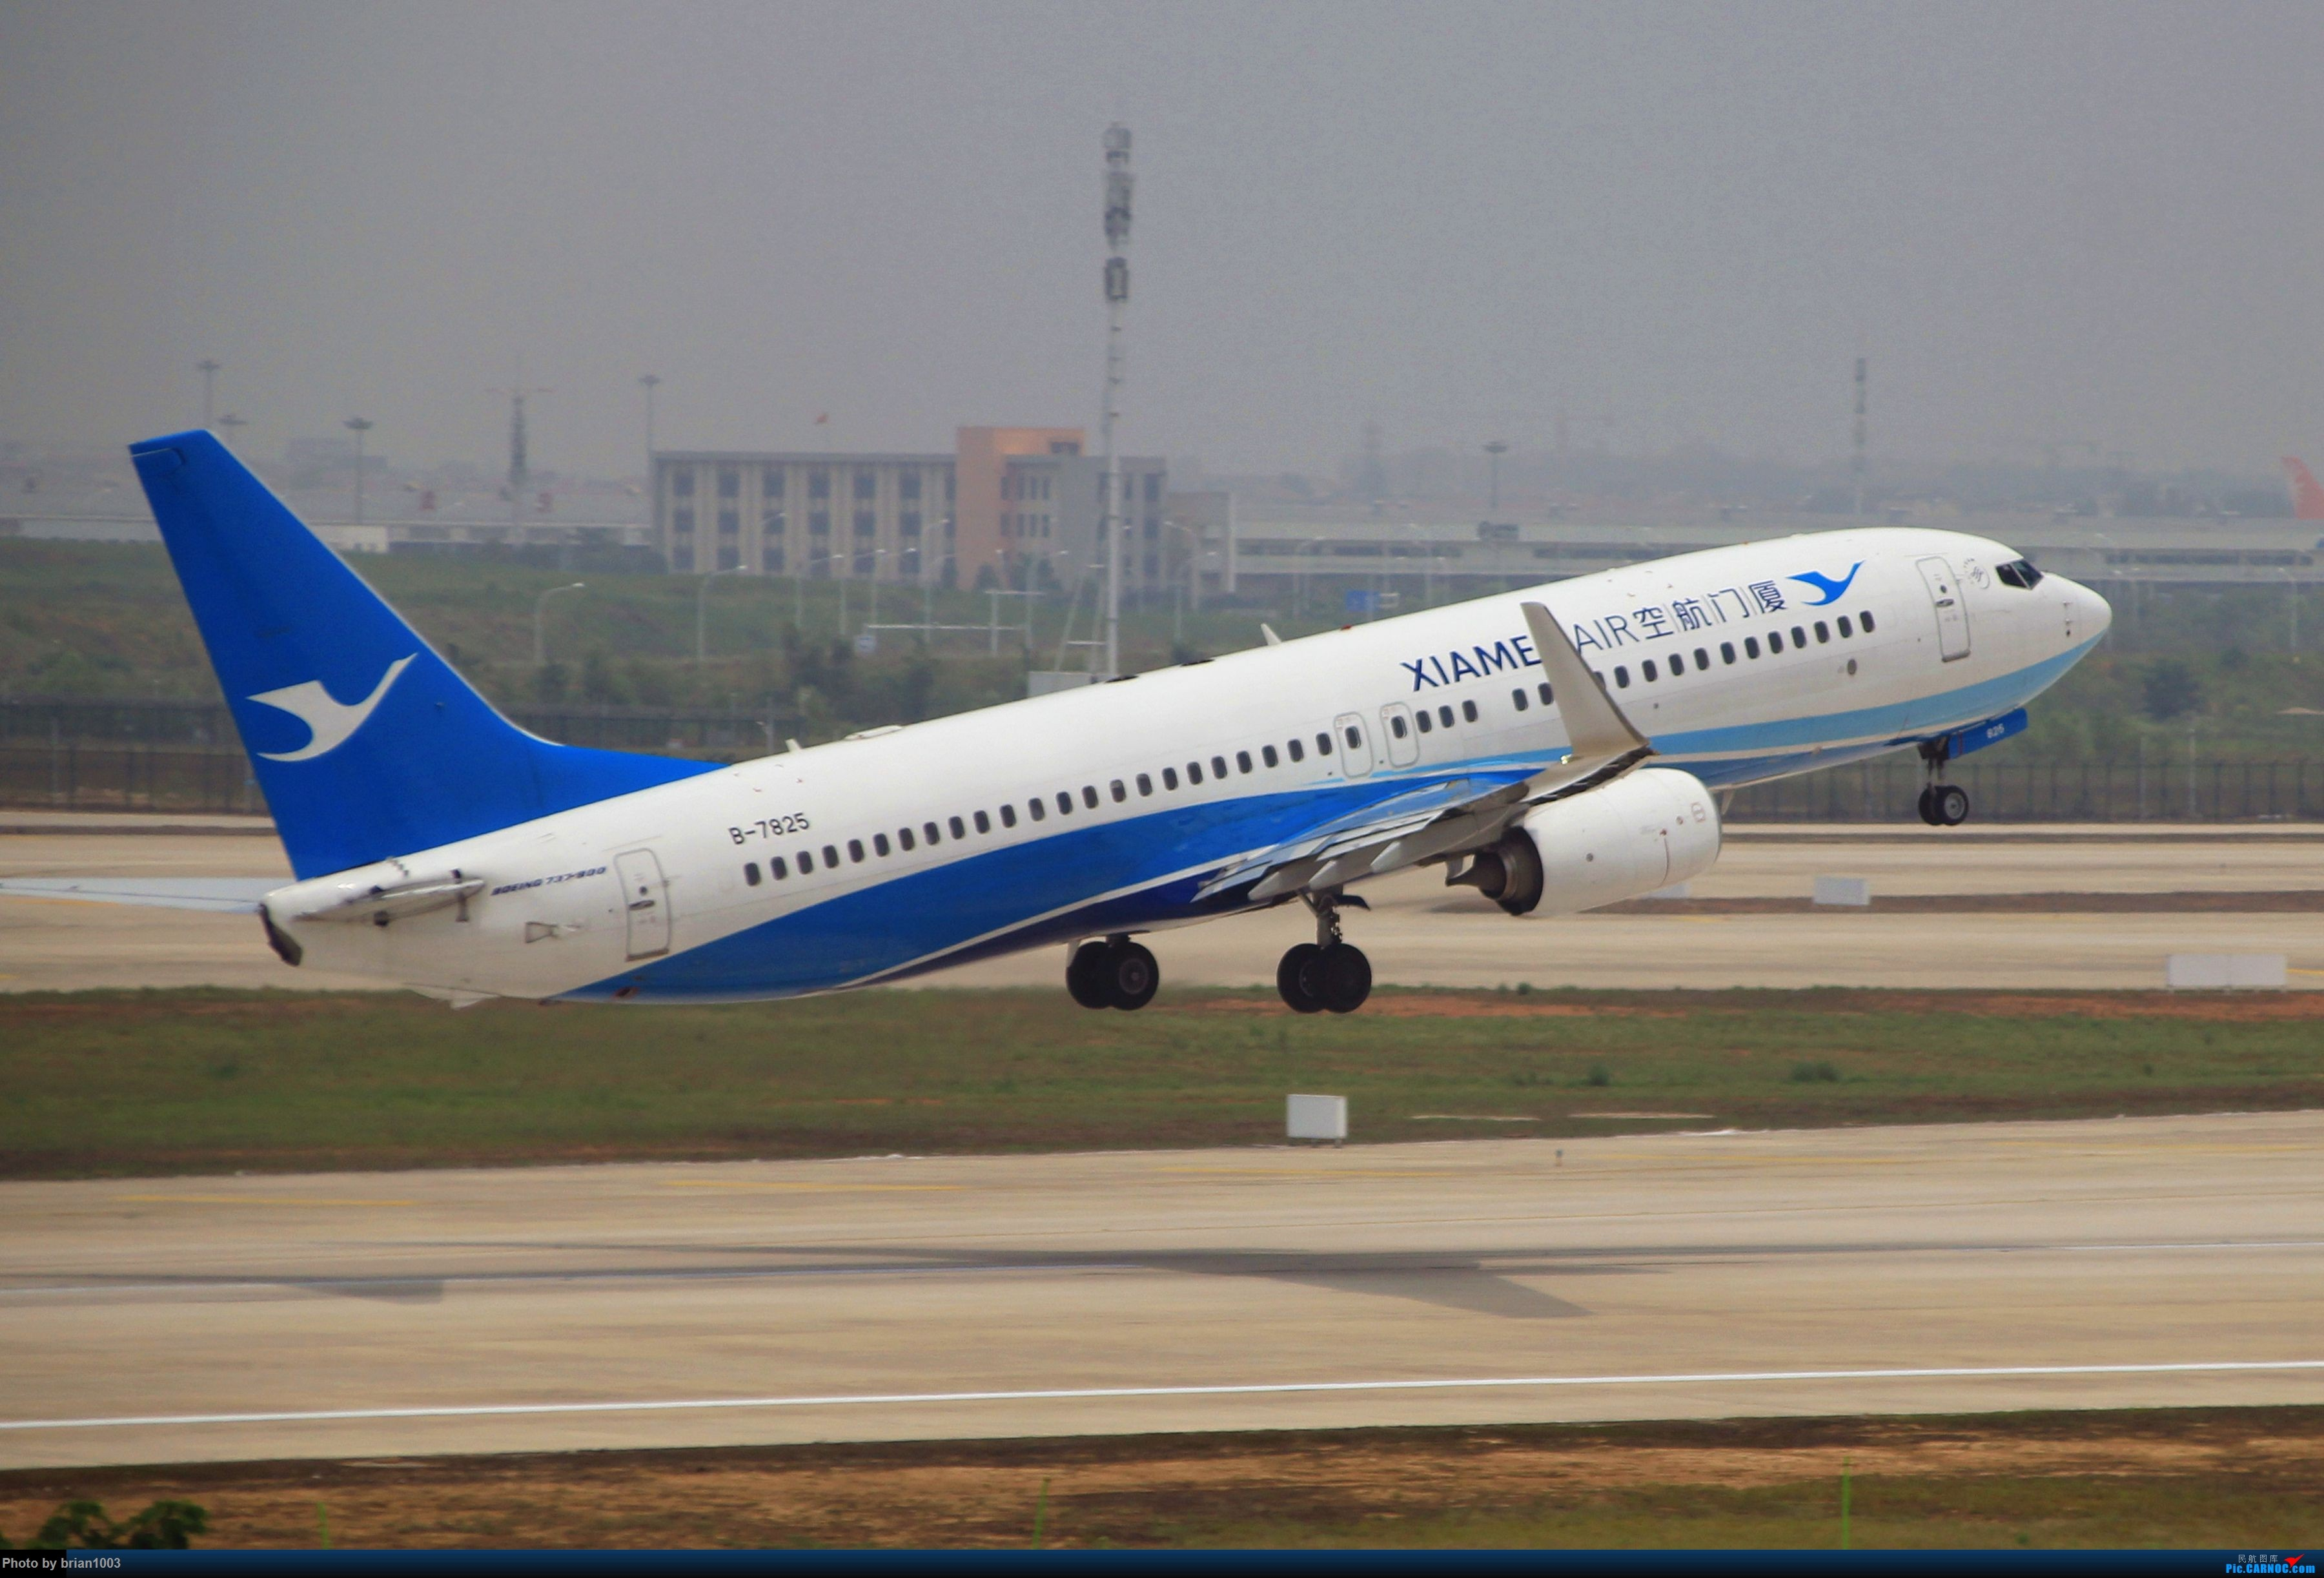 Re:[原创]WUH武汉天河机场拍机之二跑最后忙碌时 BOEING 737-800 B-7825 中国武汉天河国际机场